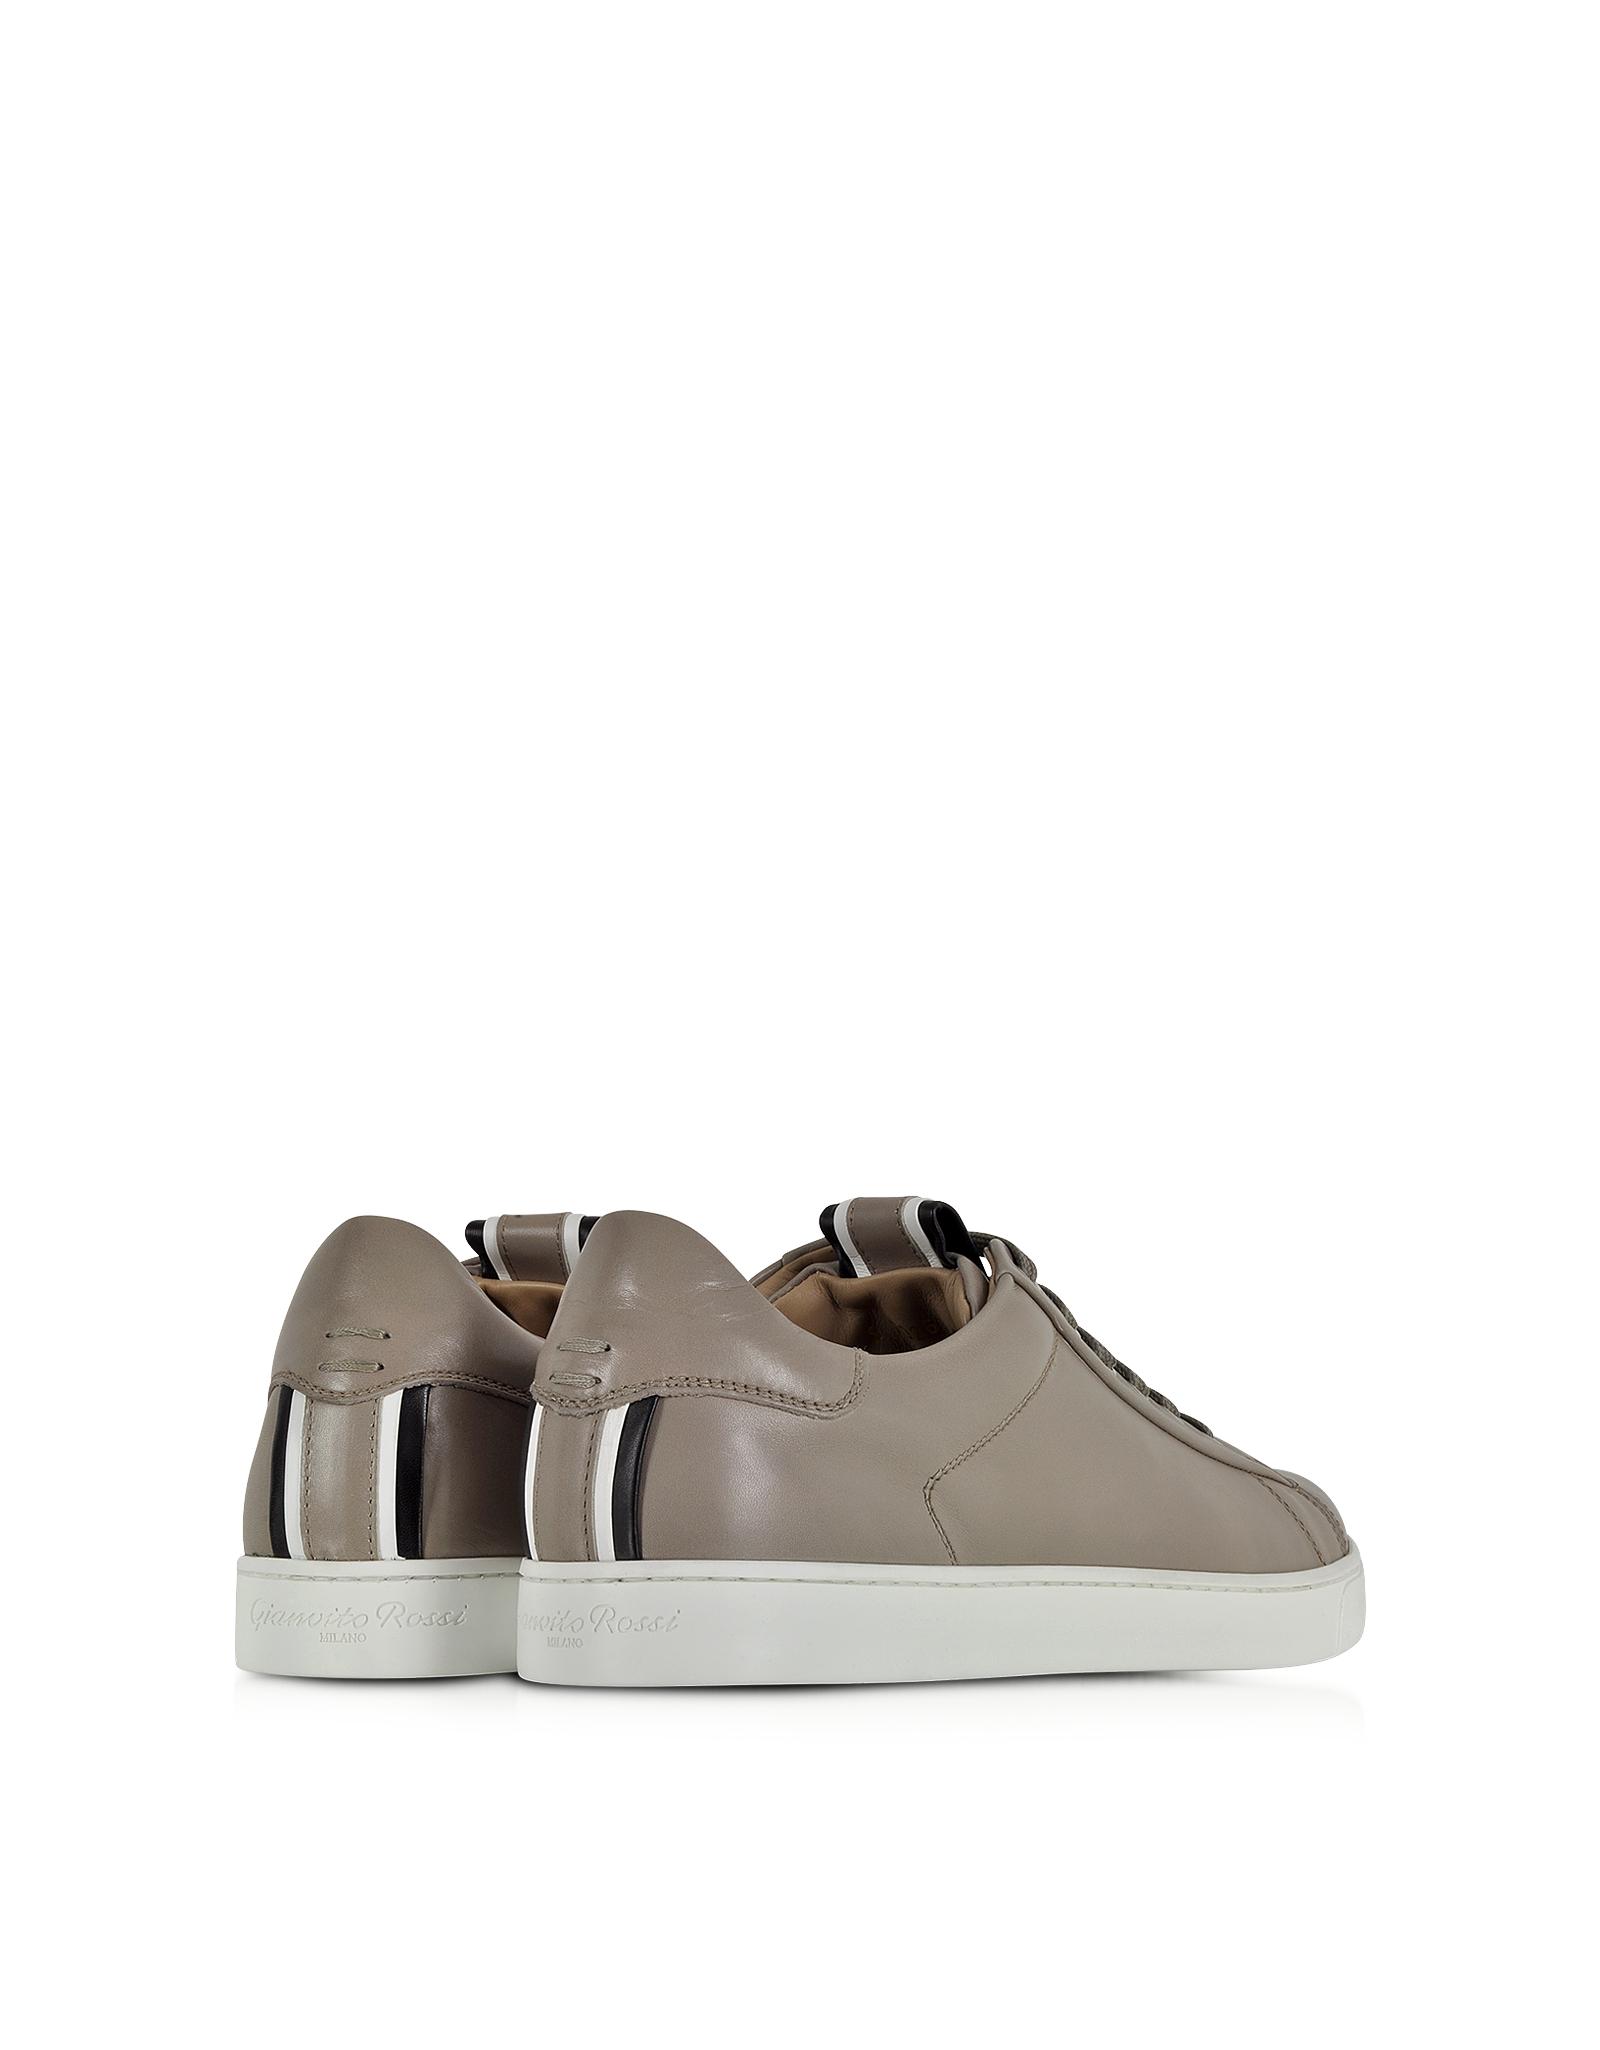 Gianvito rossi Dust White & Black Leather Sneaker in Gray ...